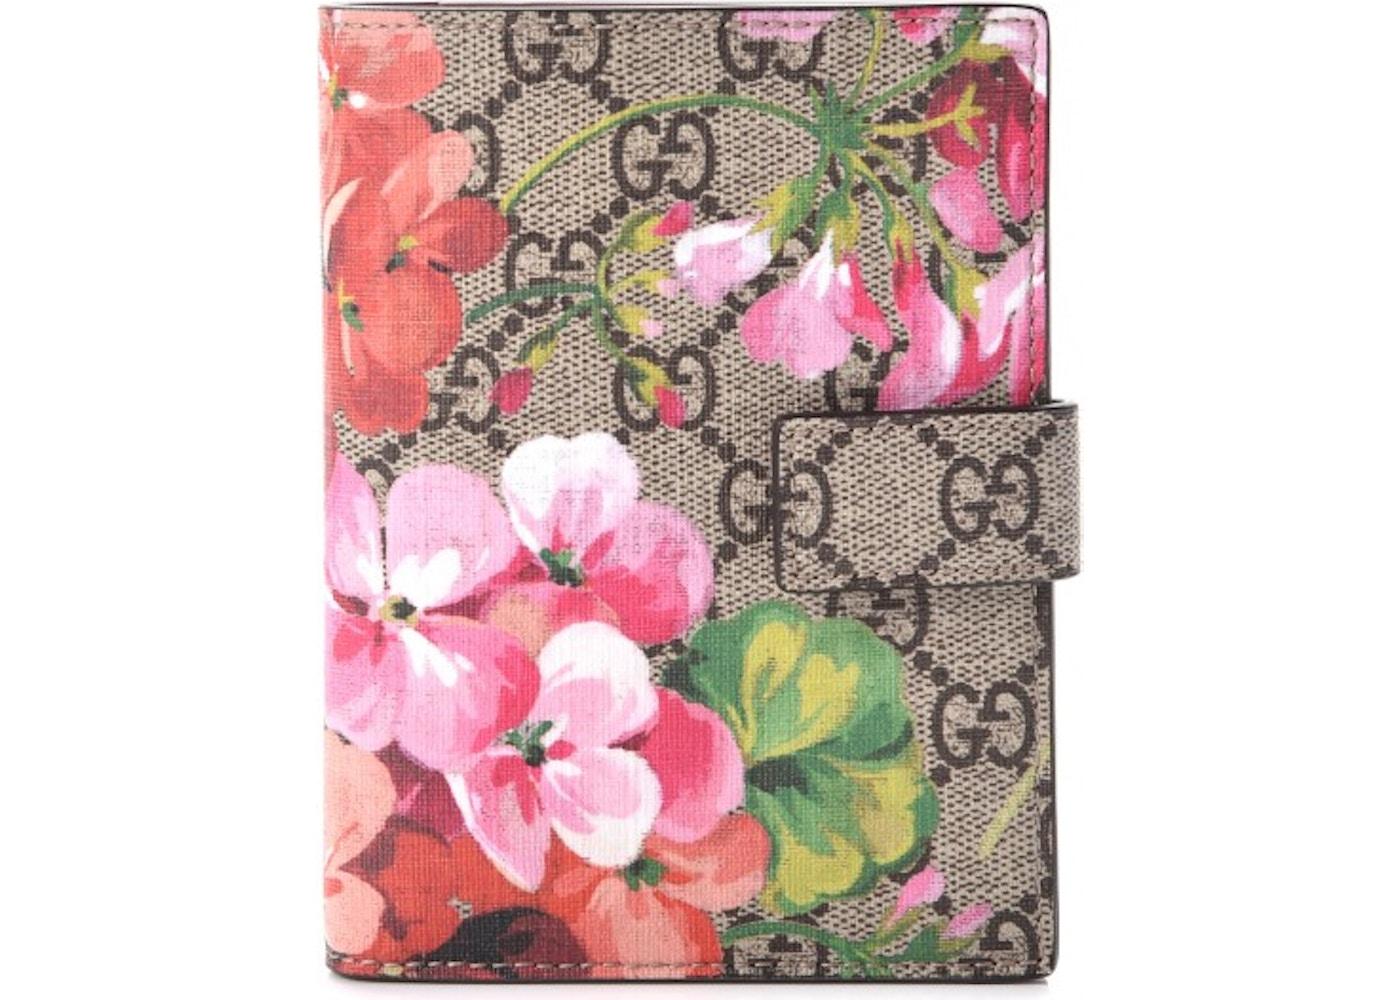 new style d71d5 ef557 Gucci Passport Case Monogram GG Supreme Blooms Print Antique Rose